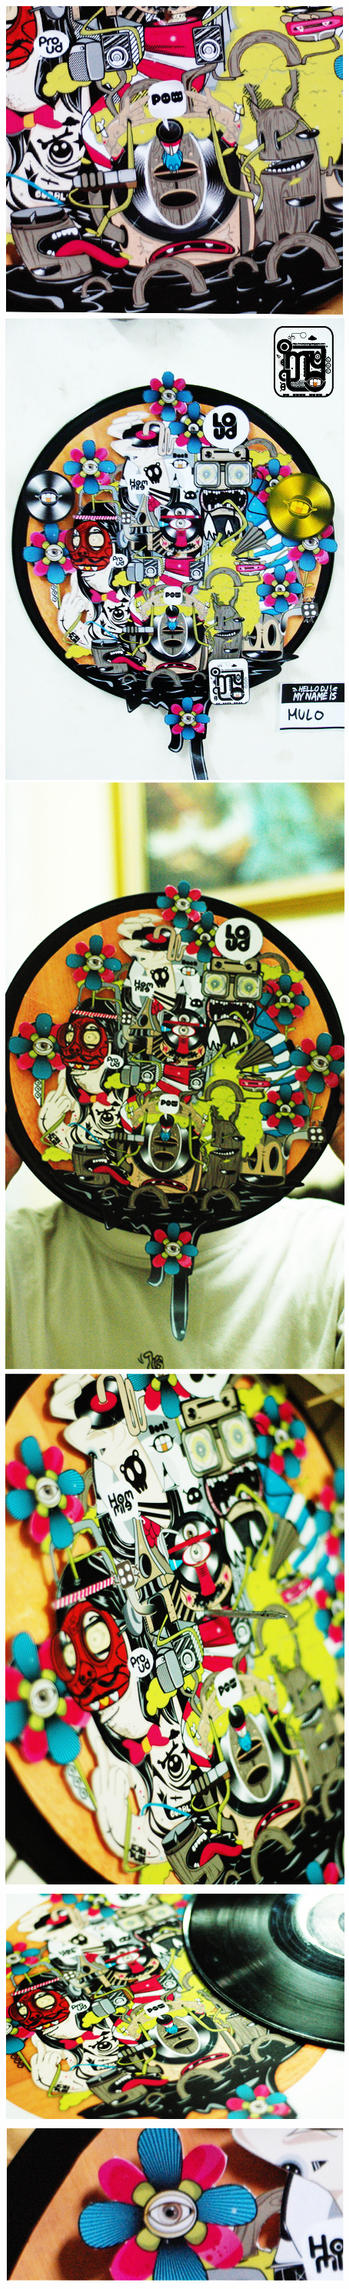 ::..Vinyl Attack Recap..:: by muloyoung85